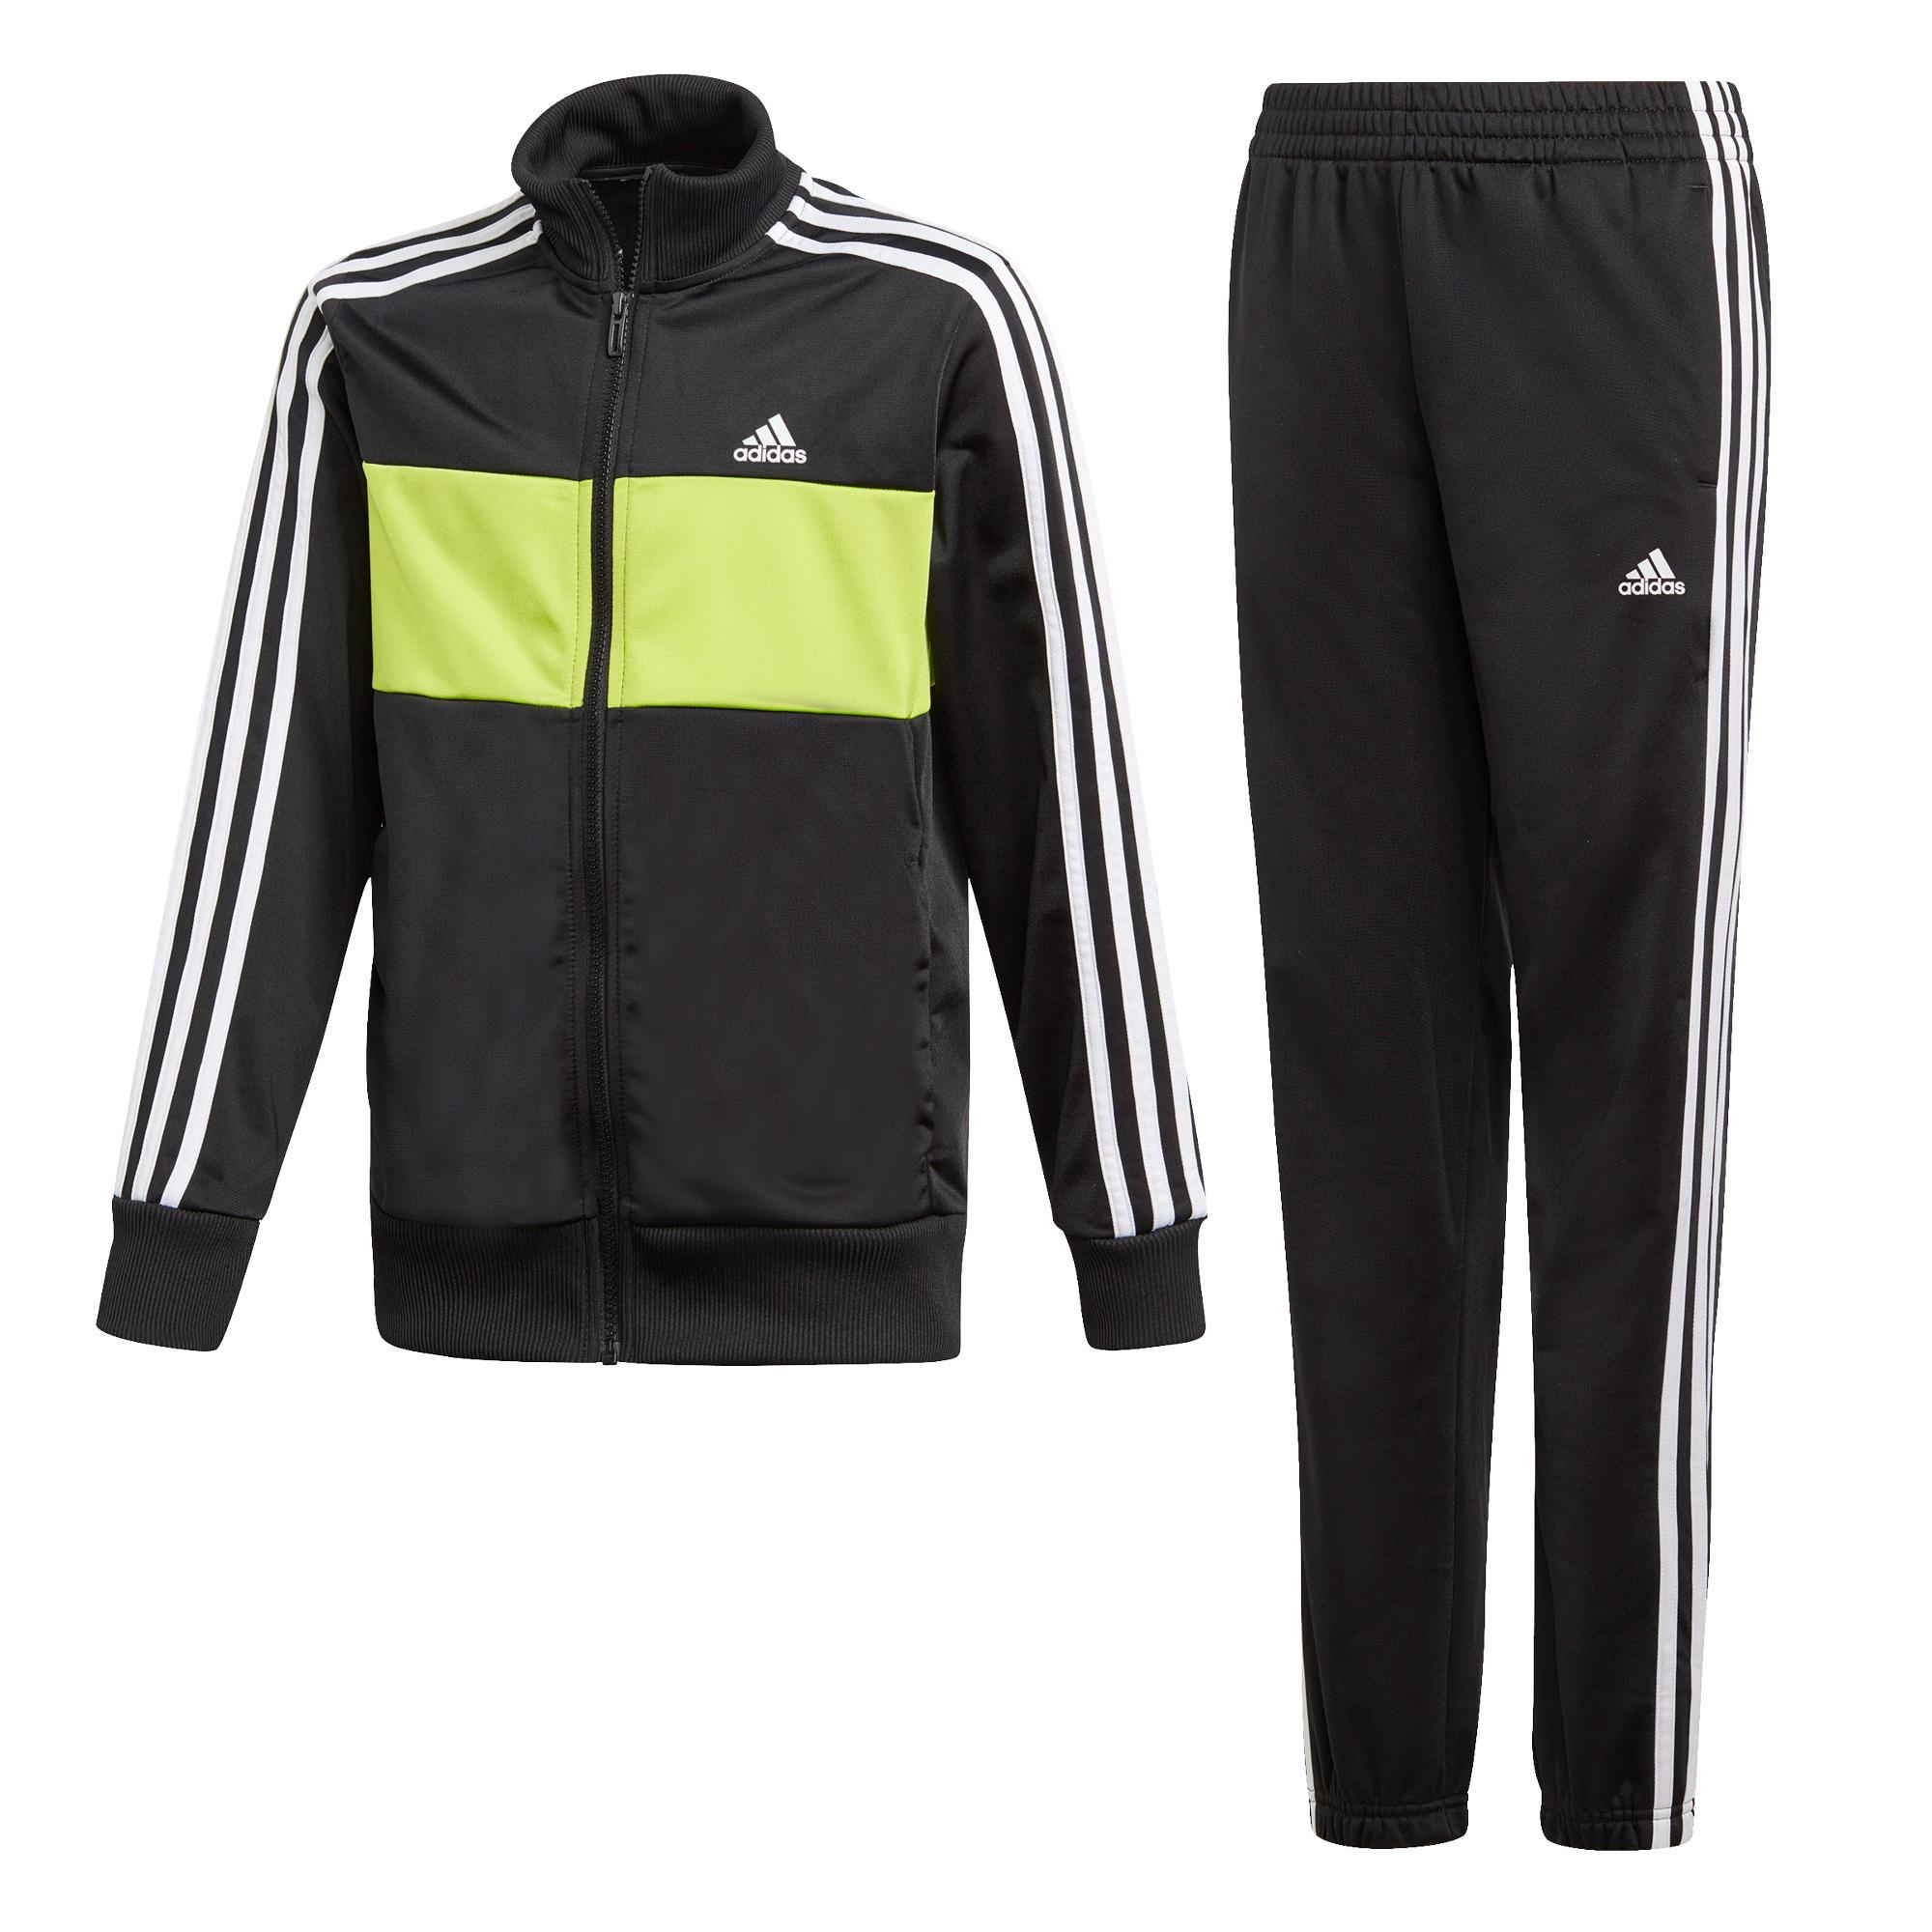 Trening Adidas Negru Băieţi imagine